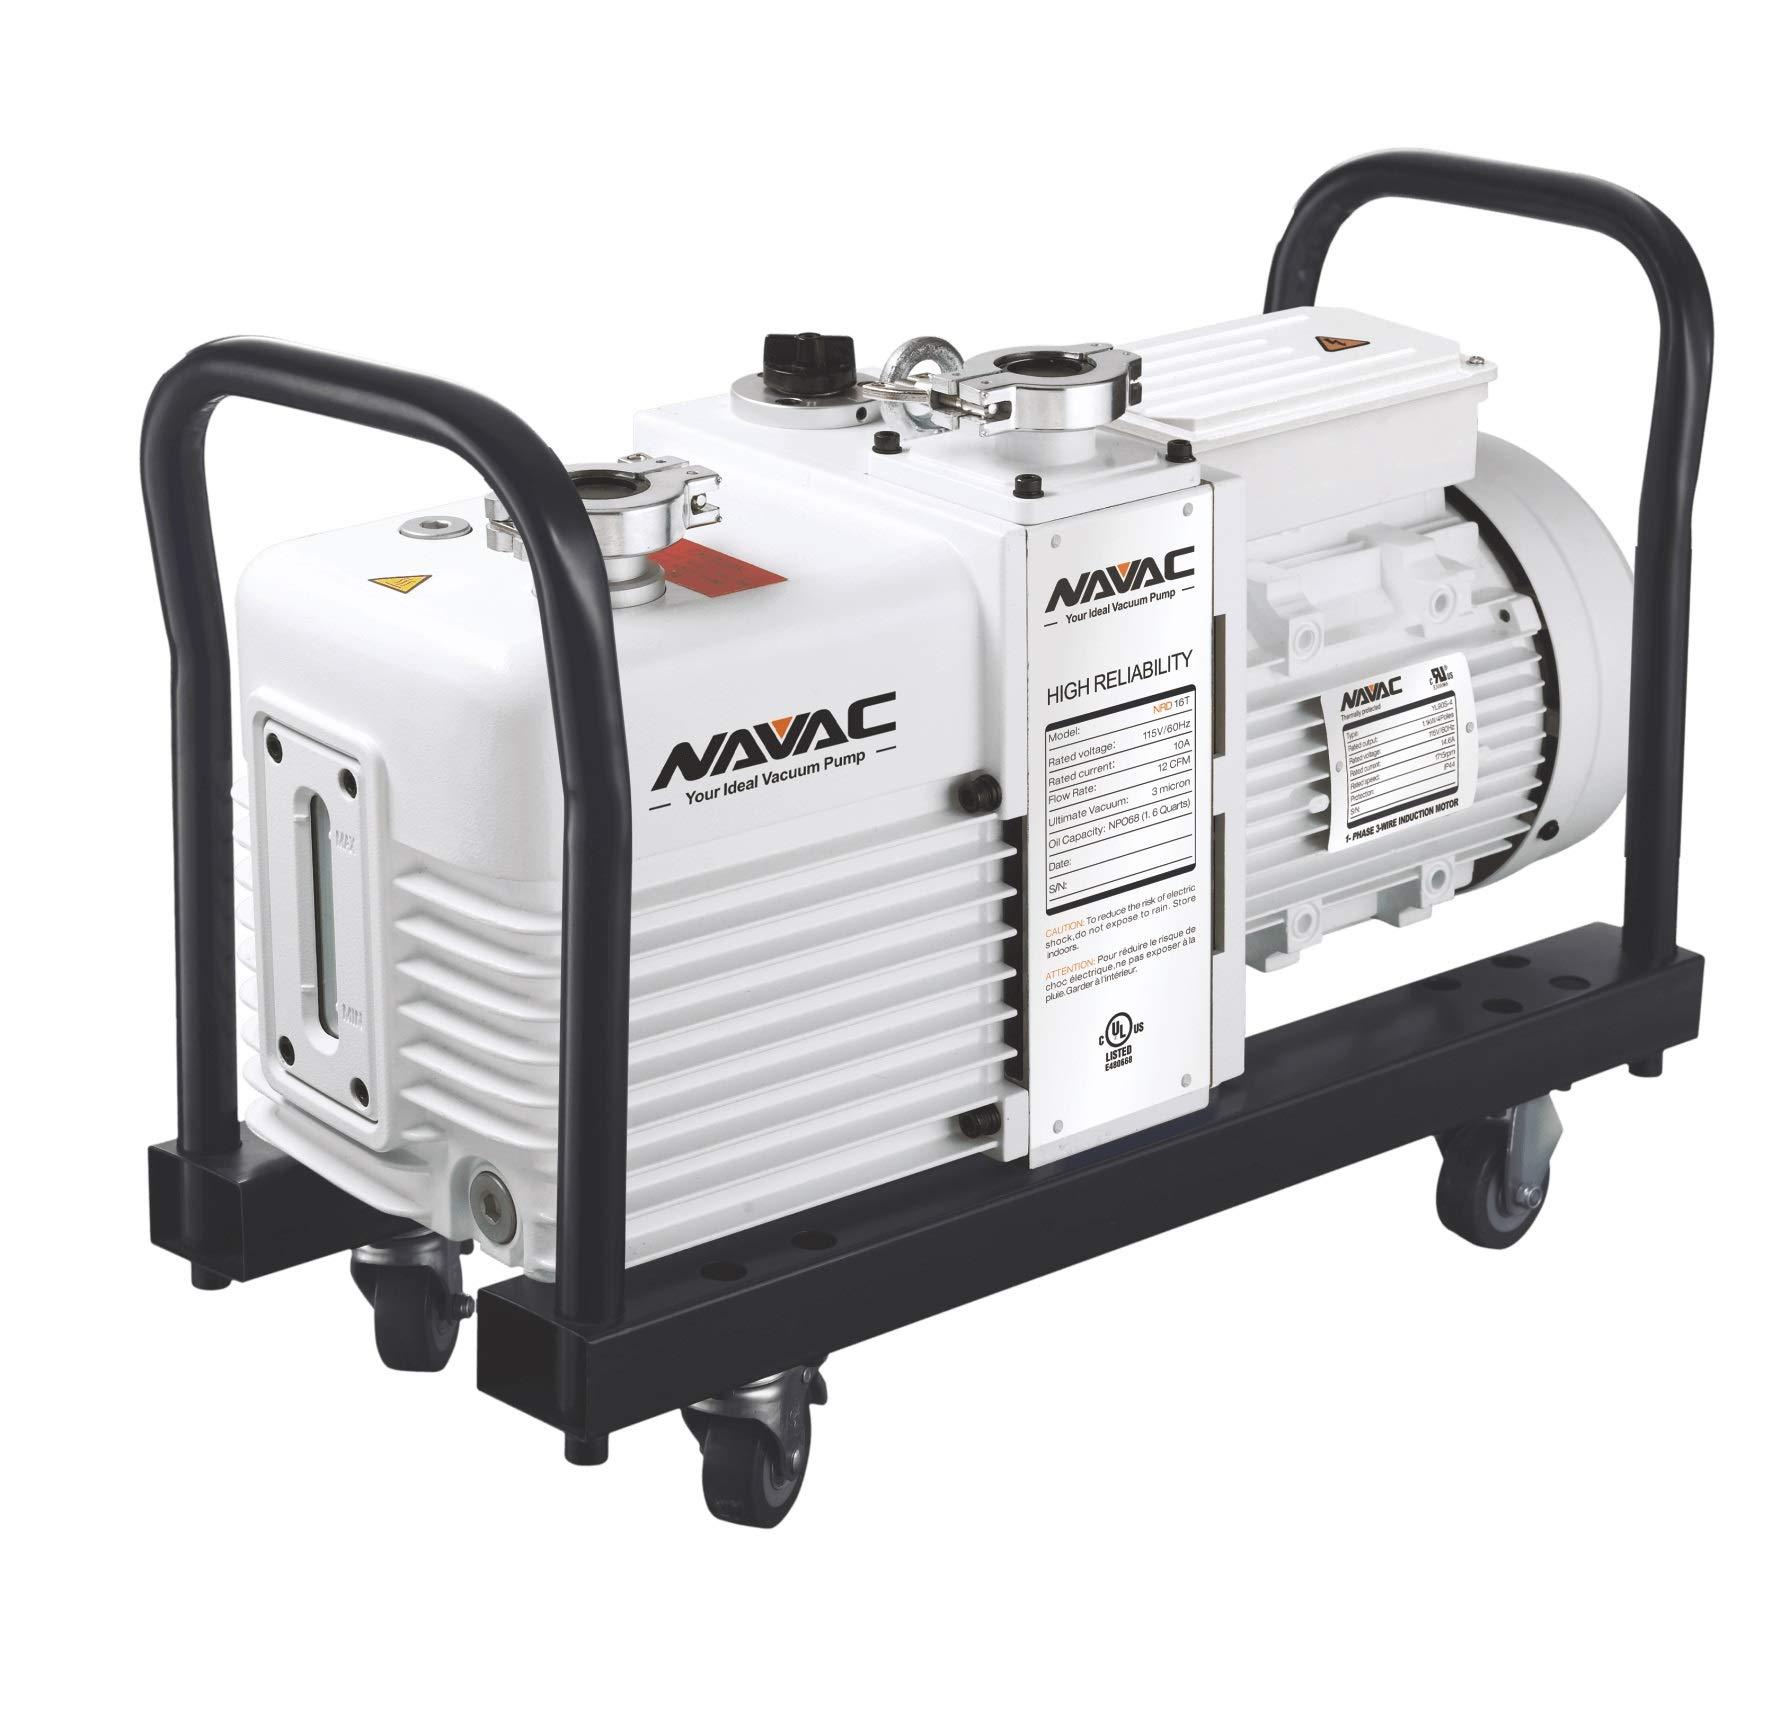 Navac Vacuum Pump, Industrial Grade, 12cfm, 3micron, Cart/Filter/Adapter (NRD16T)